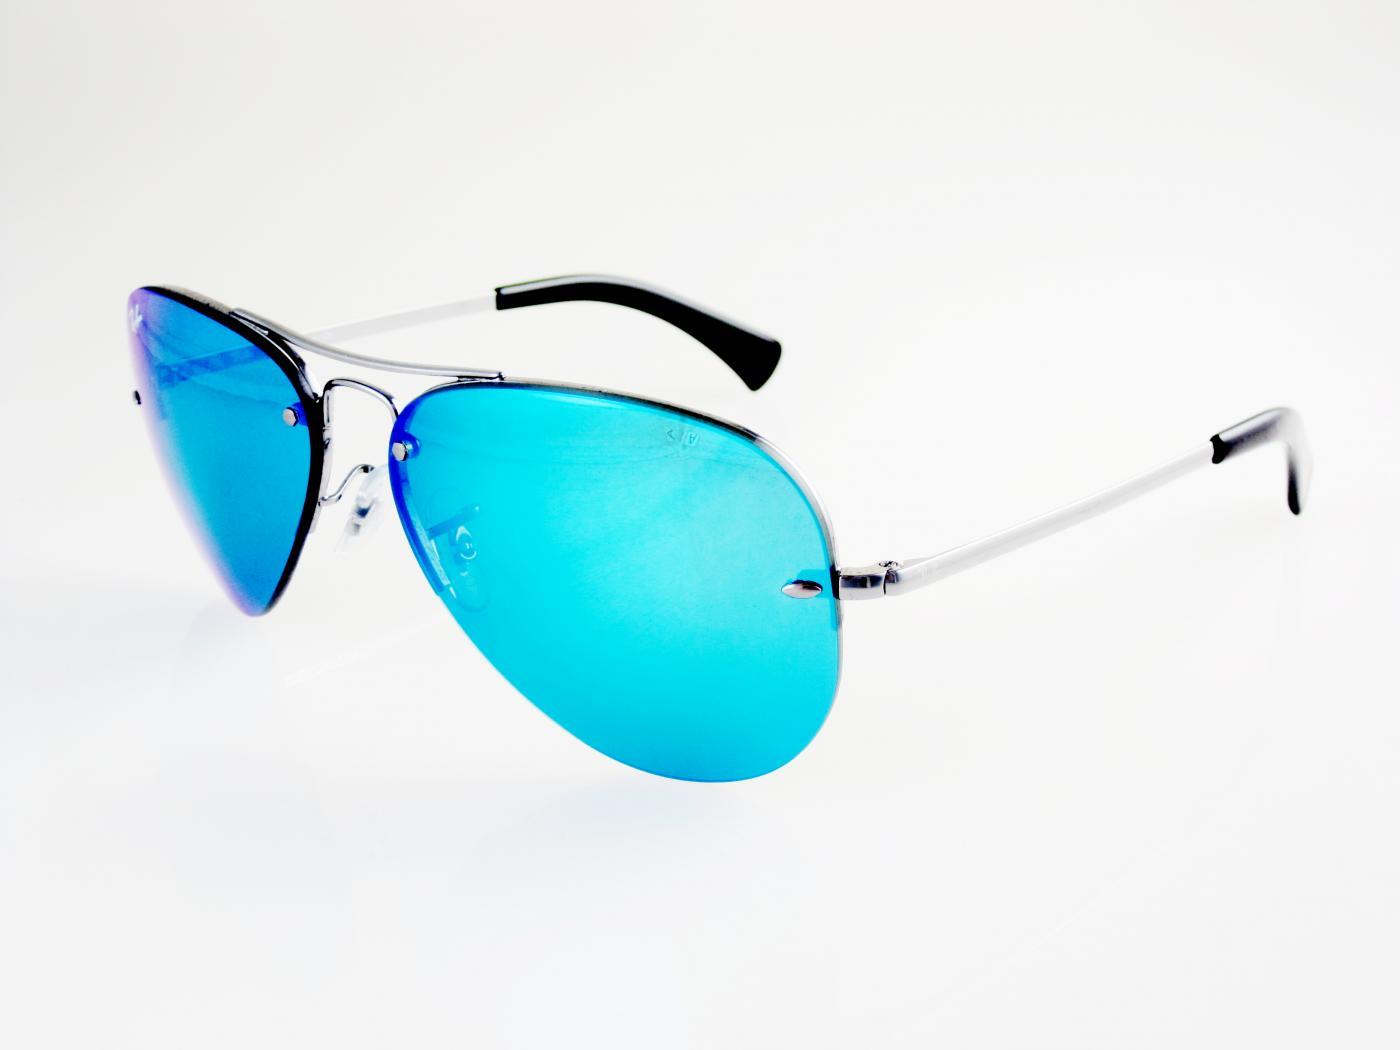 077763ef3 Unisex slnečné okuliare Ray Ban - Aviator | oftalens.sk